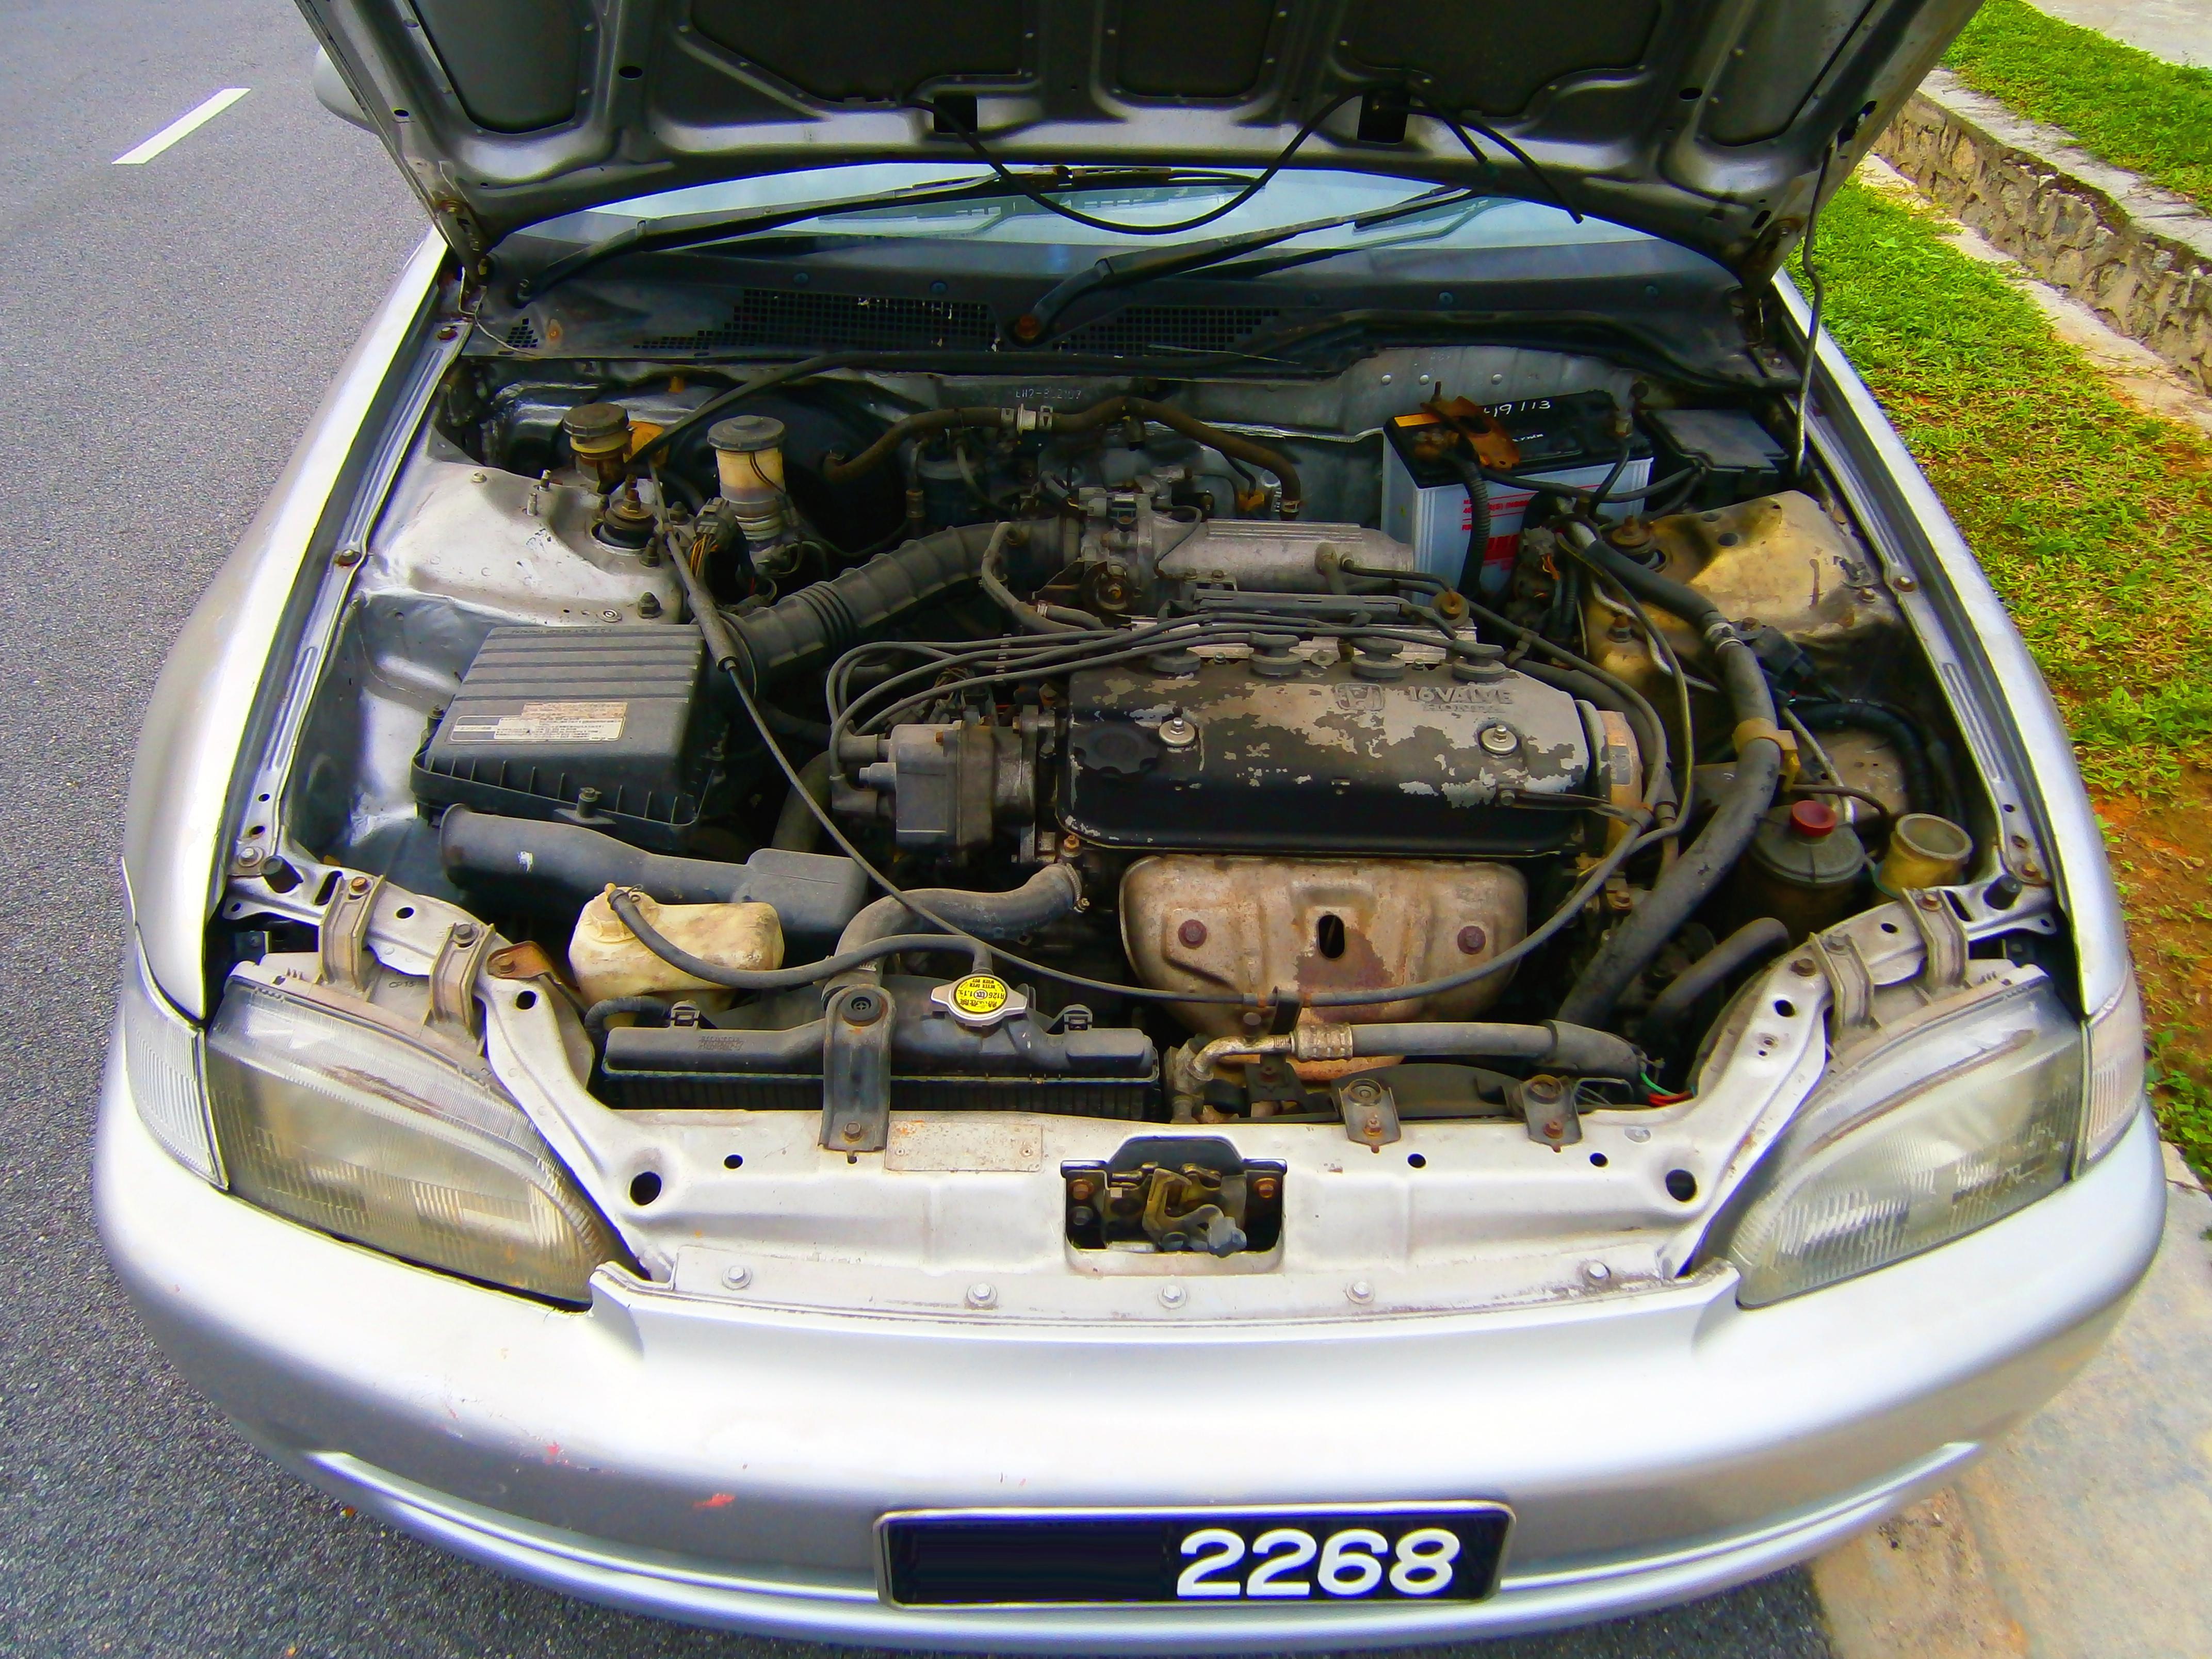 Elegant File:1.6L Honda VTEC Engine In A 1992 Honda Civic EH5 Saloon In Puchong